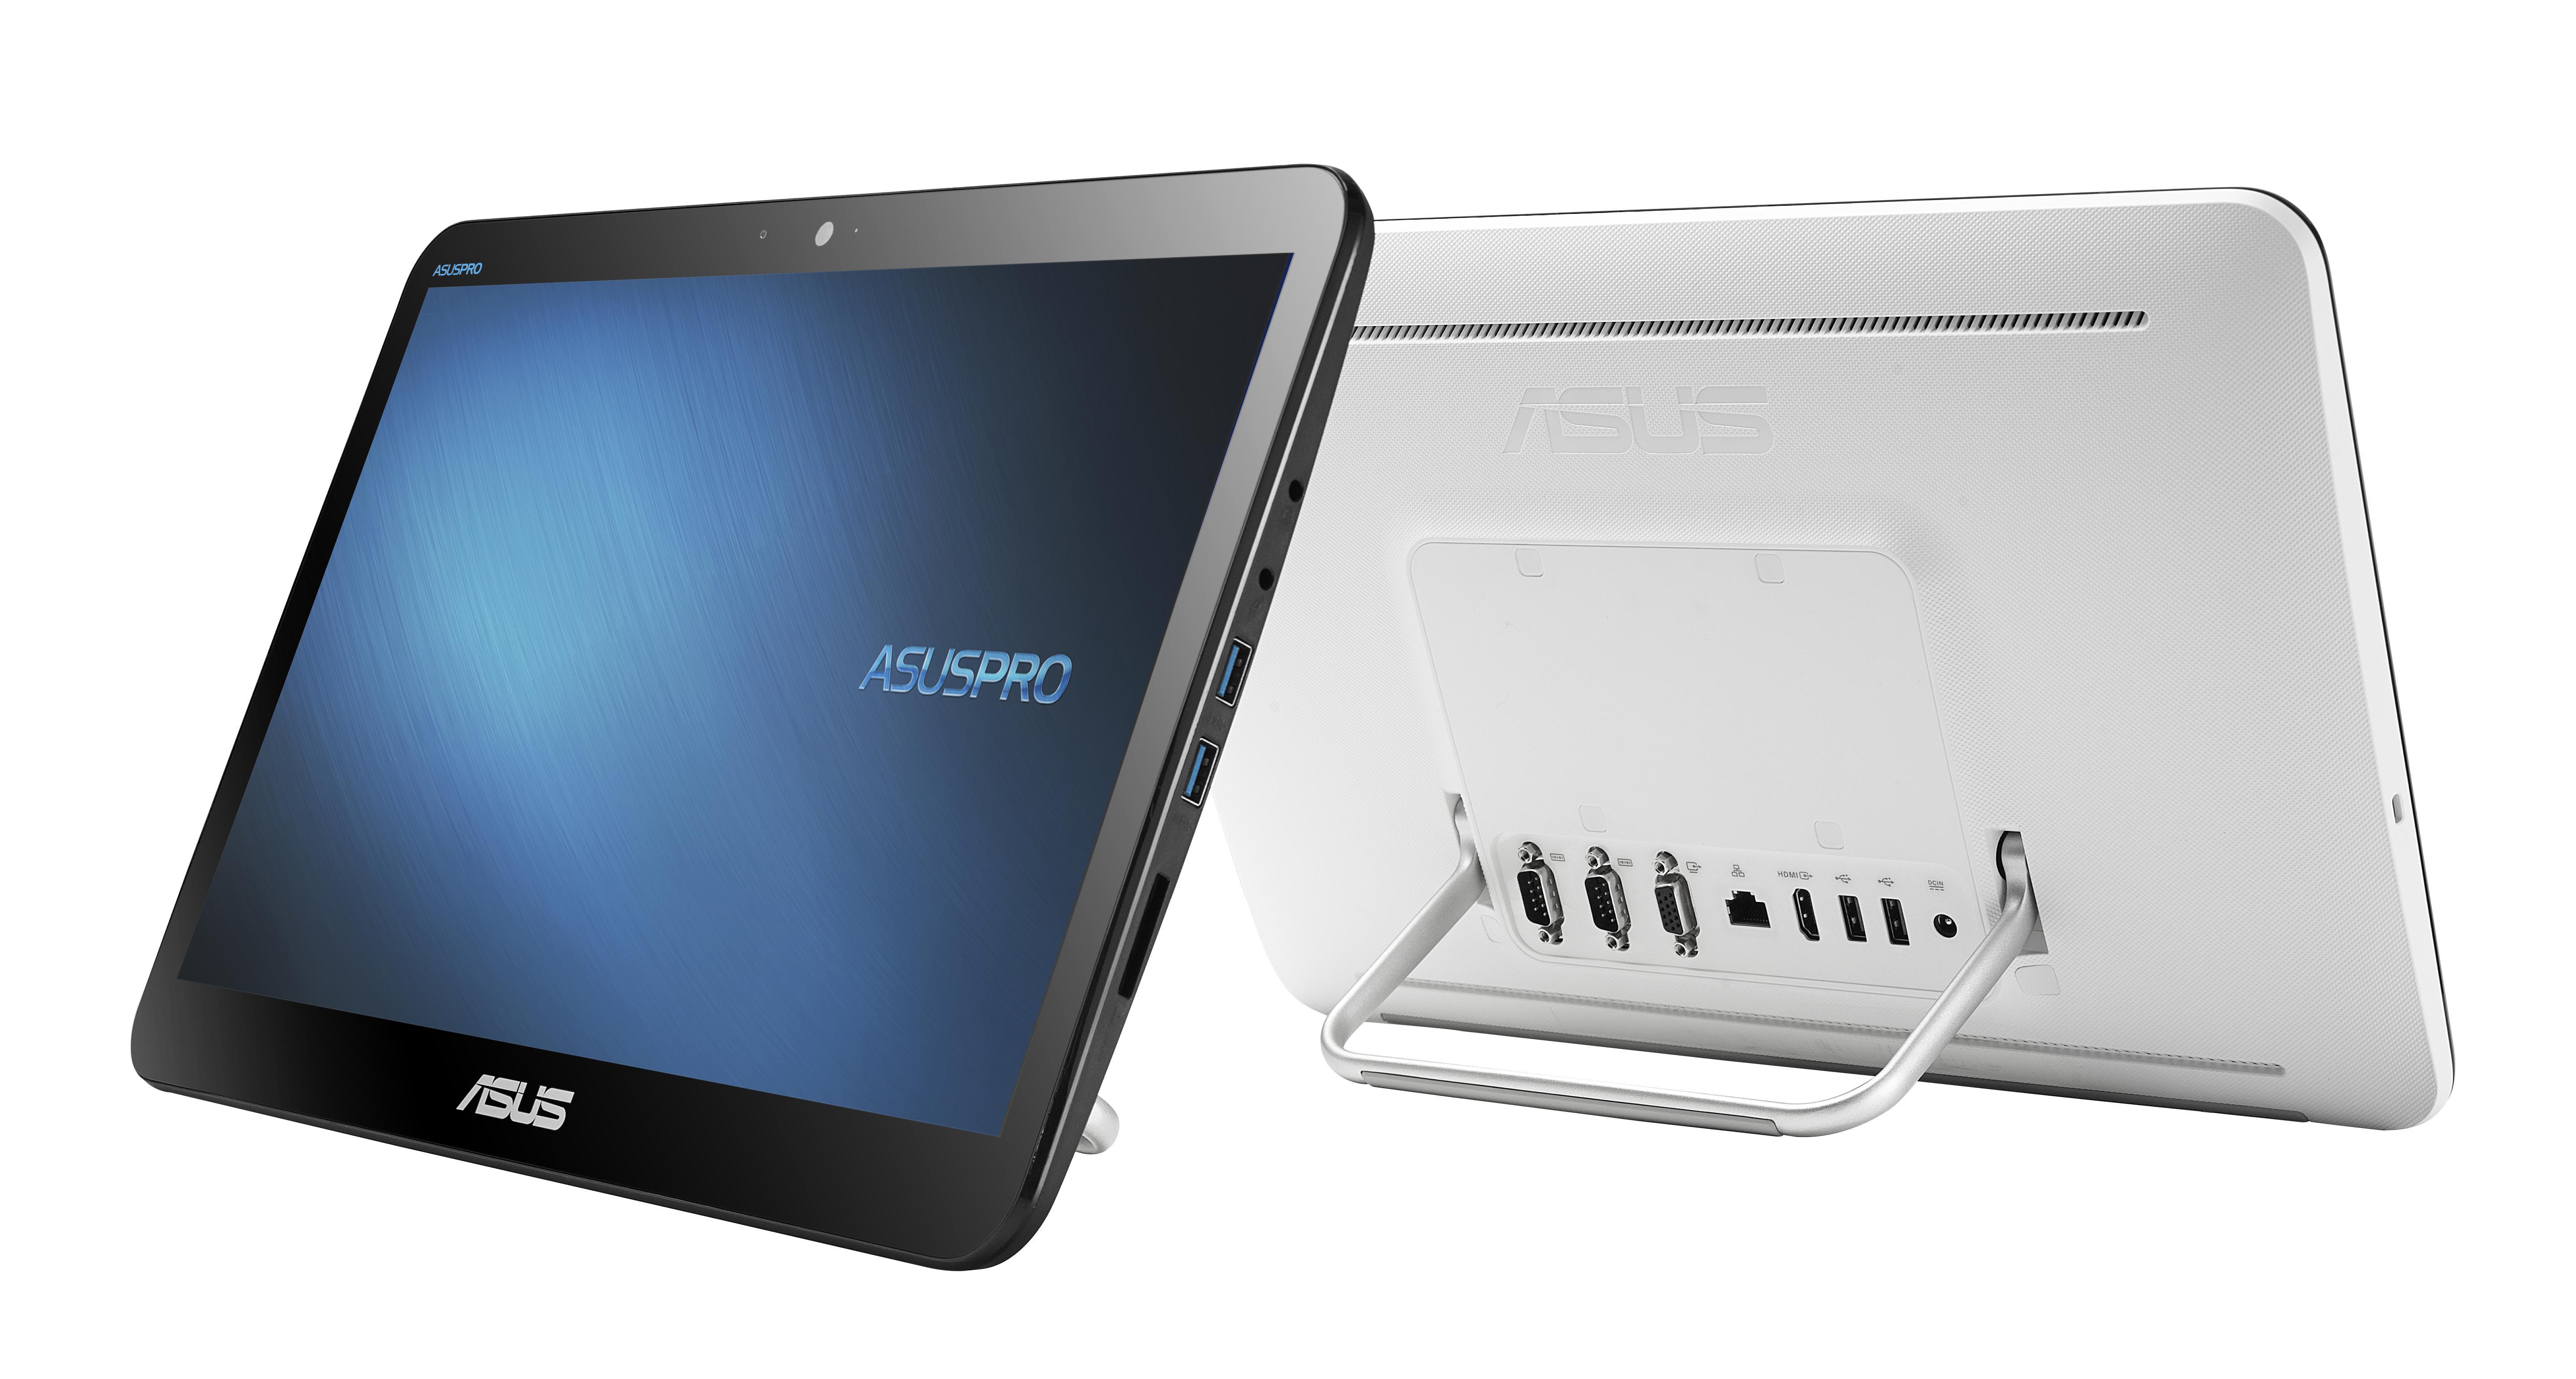 "ASUS AIO A4110-WD009M N3150/2GB/500GB HDD/15,6"" HD/multi-touch/no OS/white"